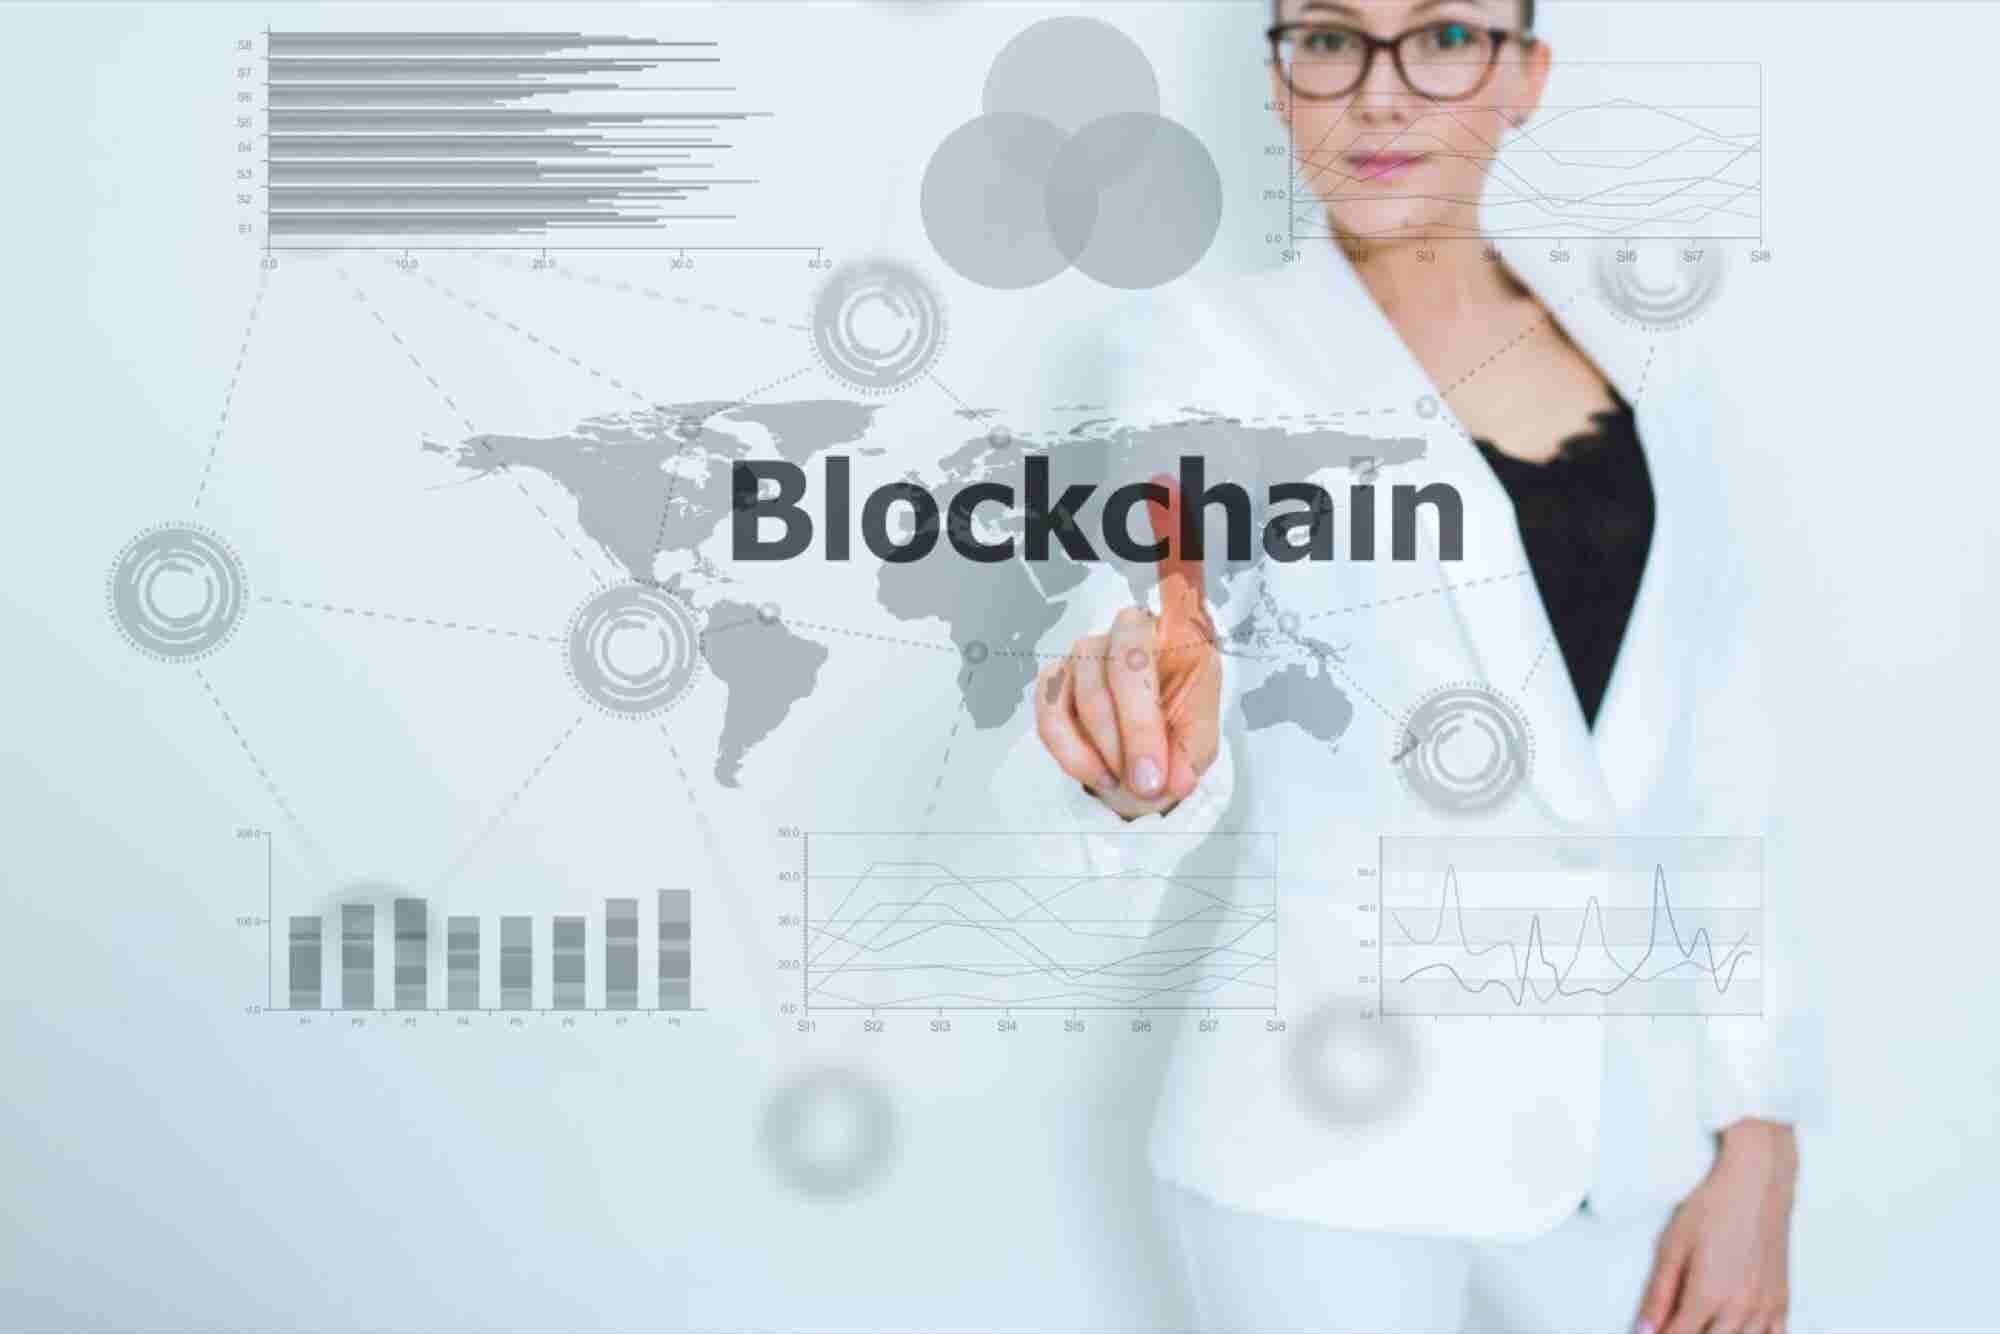 8 Influential Women Making Headlines in Blockchain